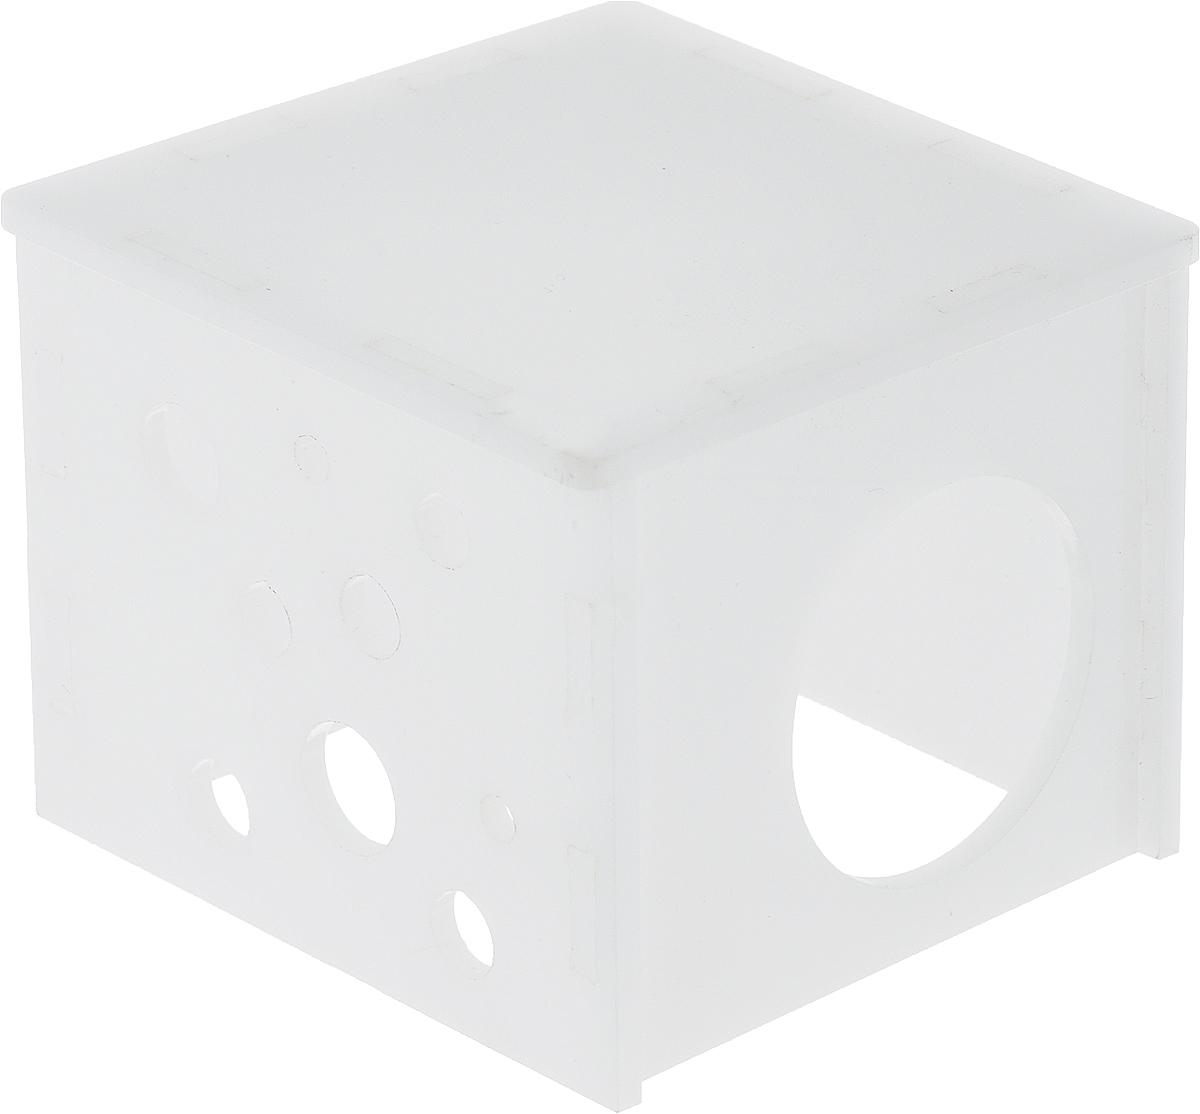 Домик для грызунов Грызлик Ам Куб, цвет: белый, 8 х 8 х 7 см0120710Дом для грызунов неразгрызаемый.